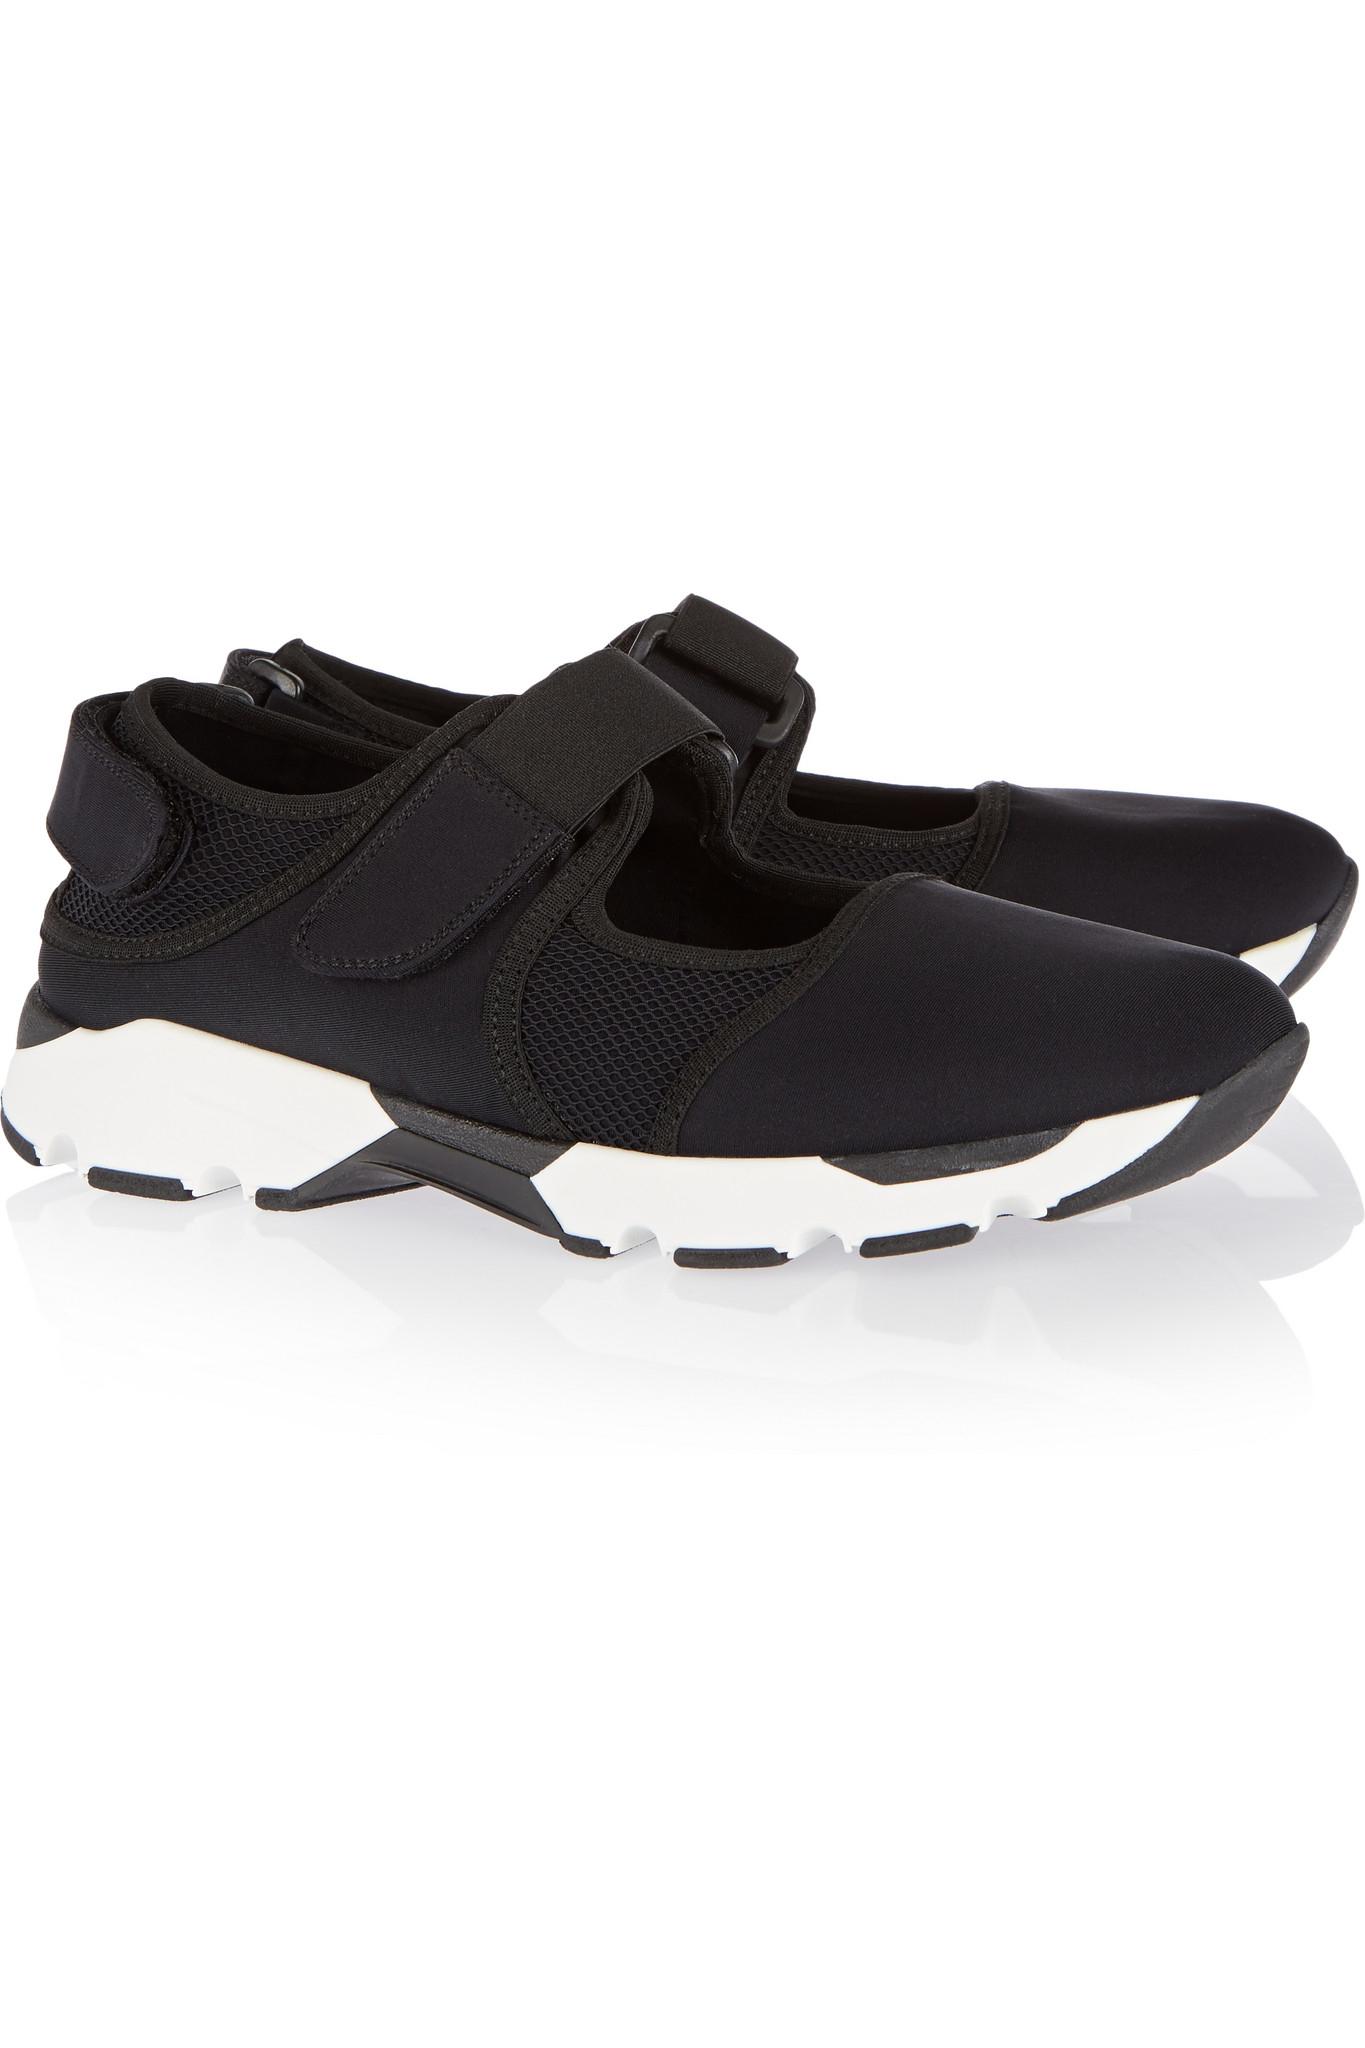 Marni Paneled Neoprene And Mesh Sneakers in Black